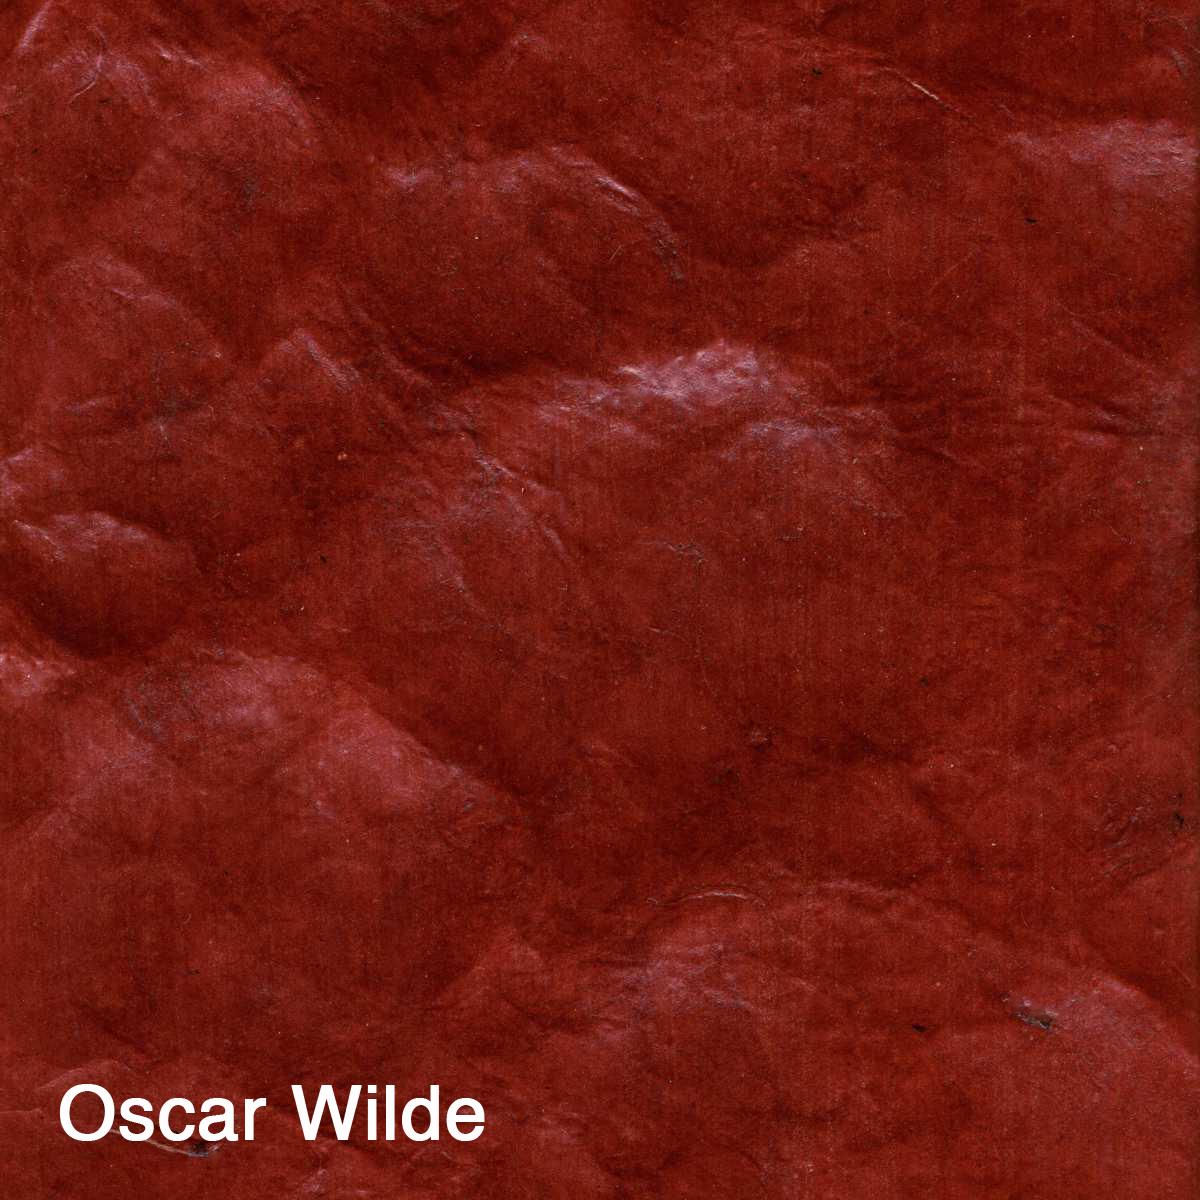 Oscar Wilde copy copy.jpg